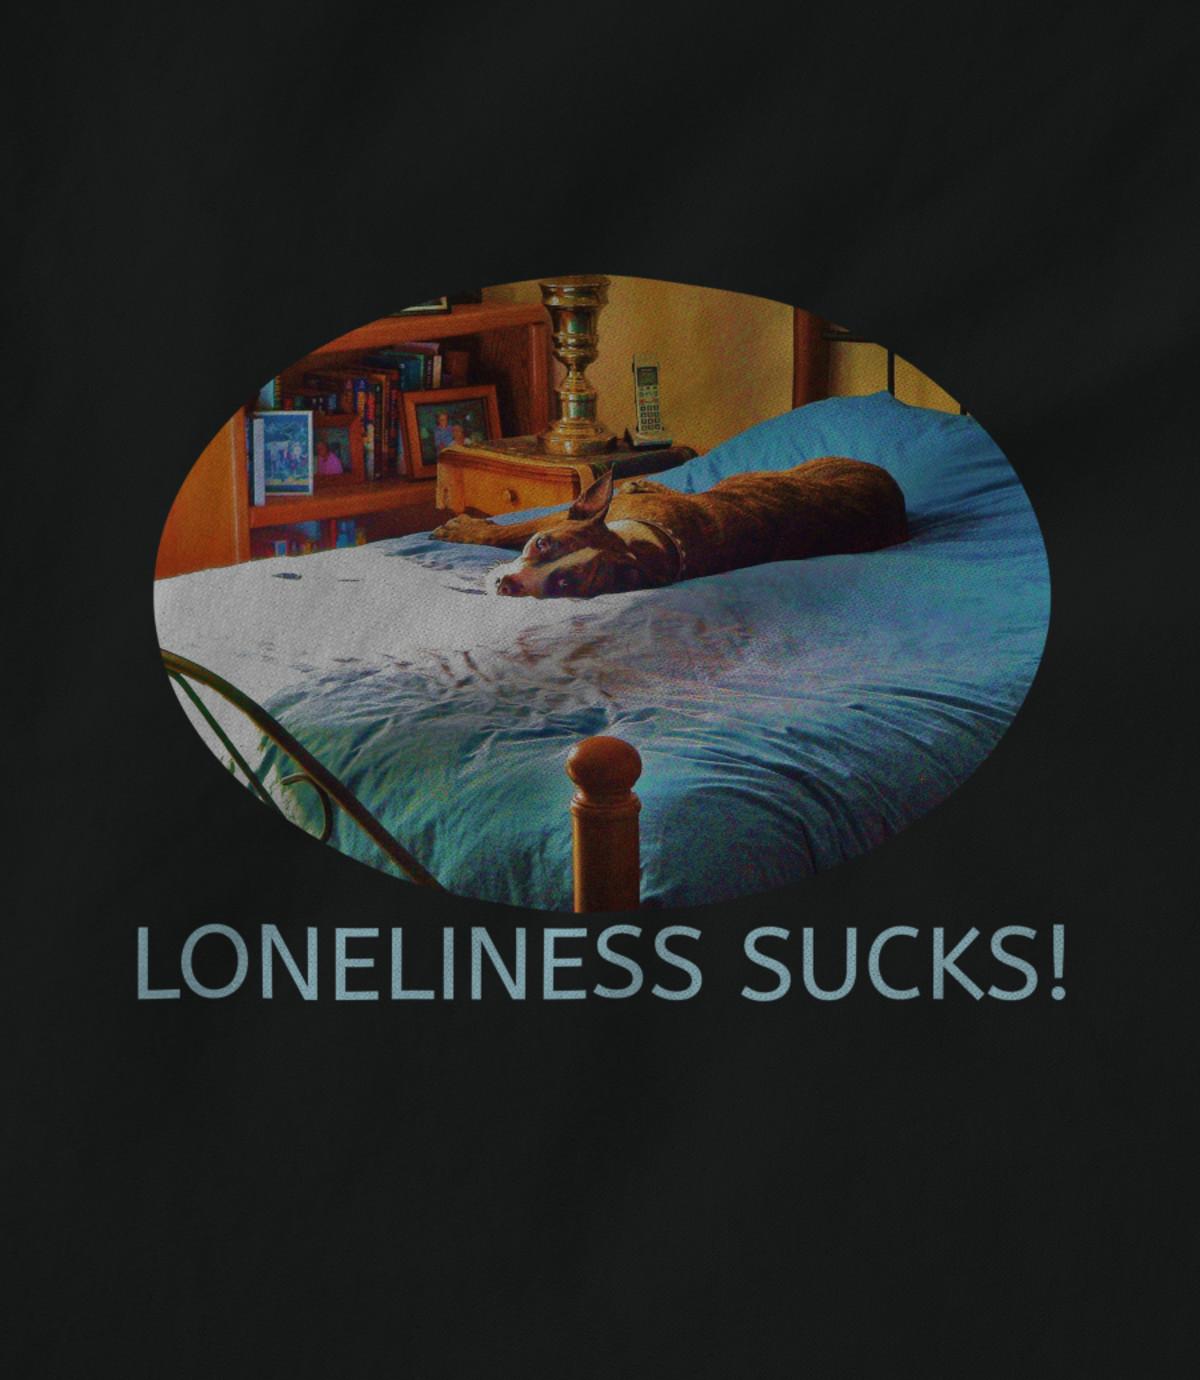 Matthew f  blowers iii   2017 lonliness sucks  1506452962